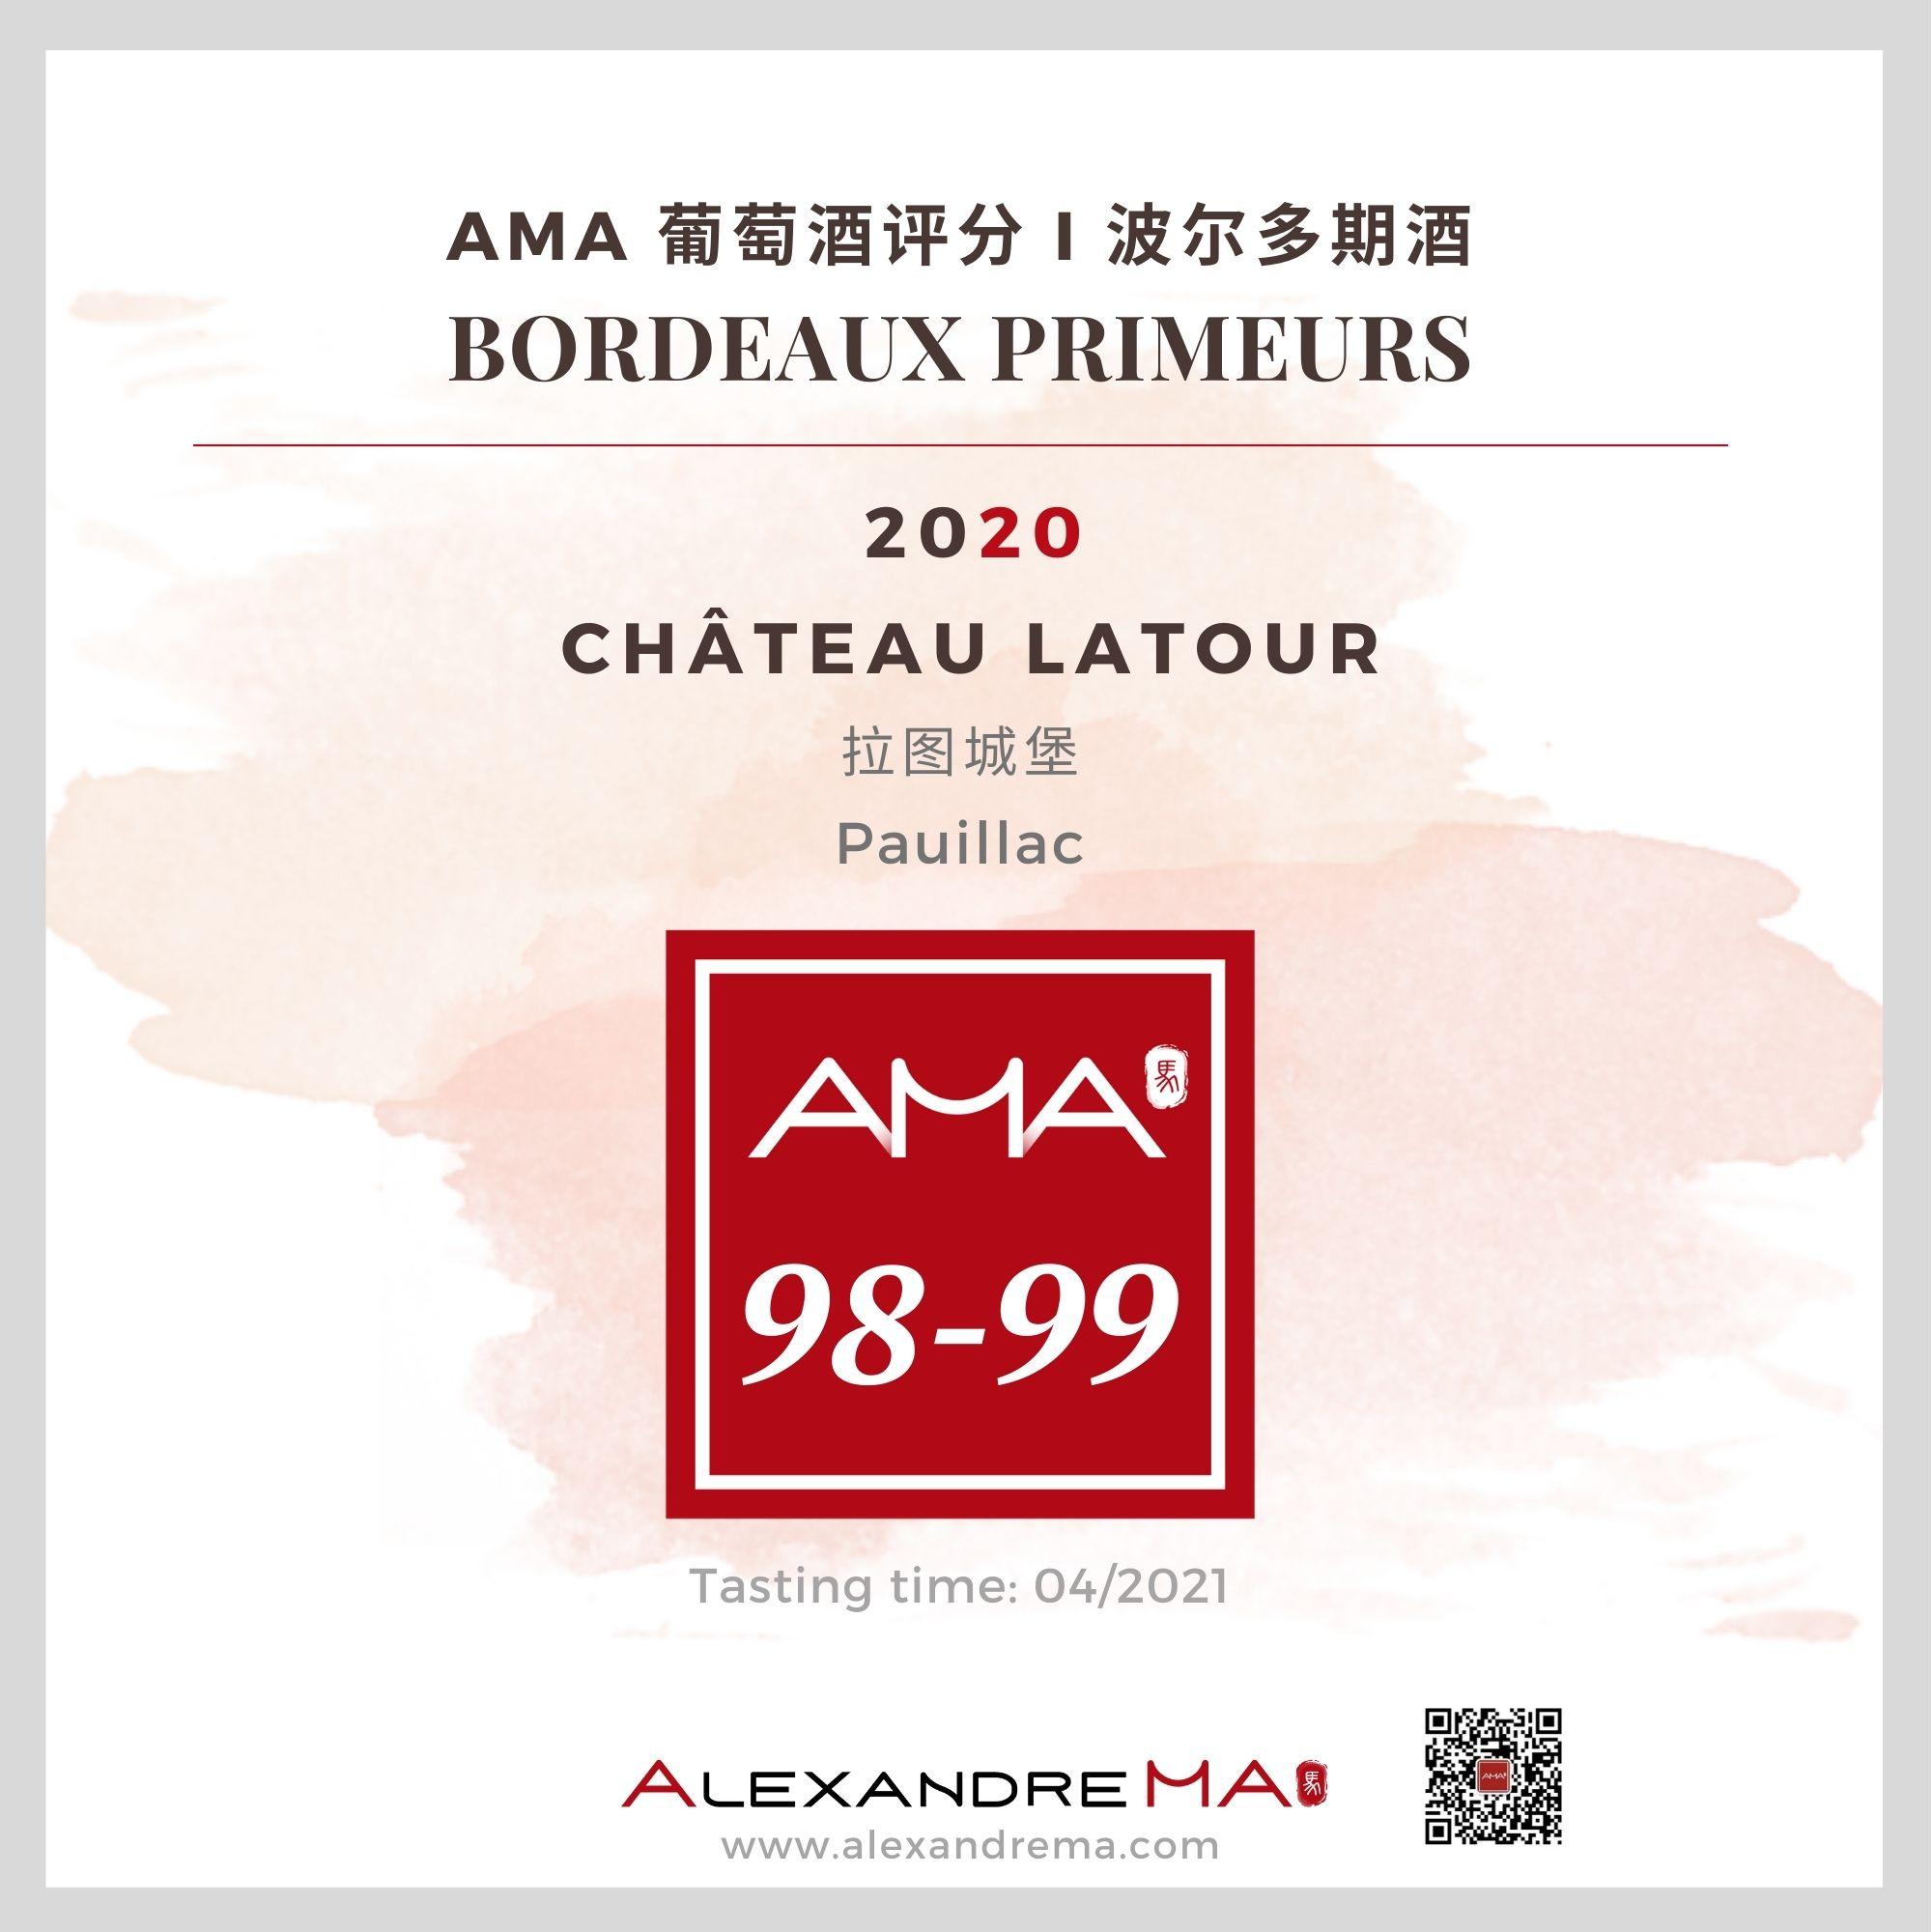 Château Latour 2020 拉图城堡 - Alexandre Ma